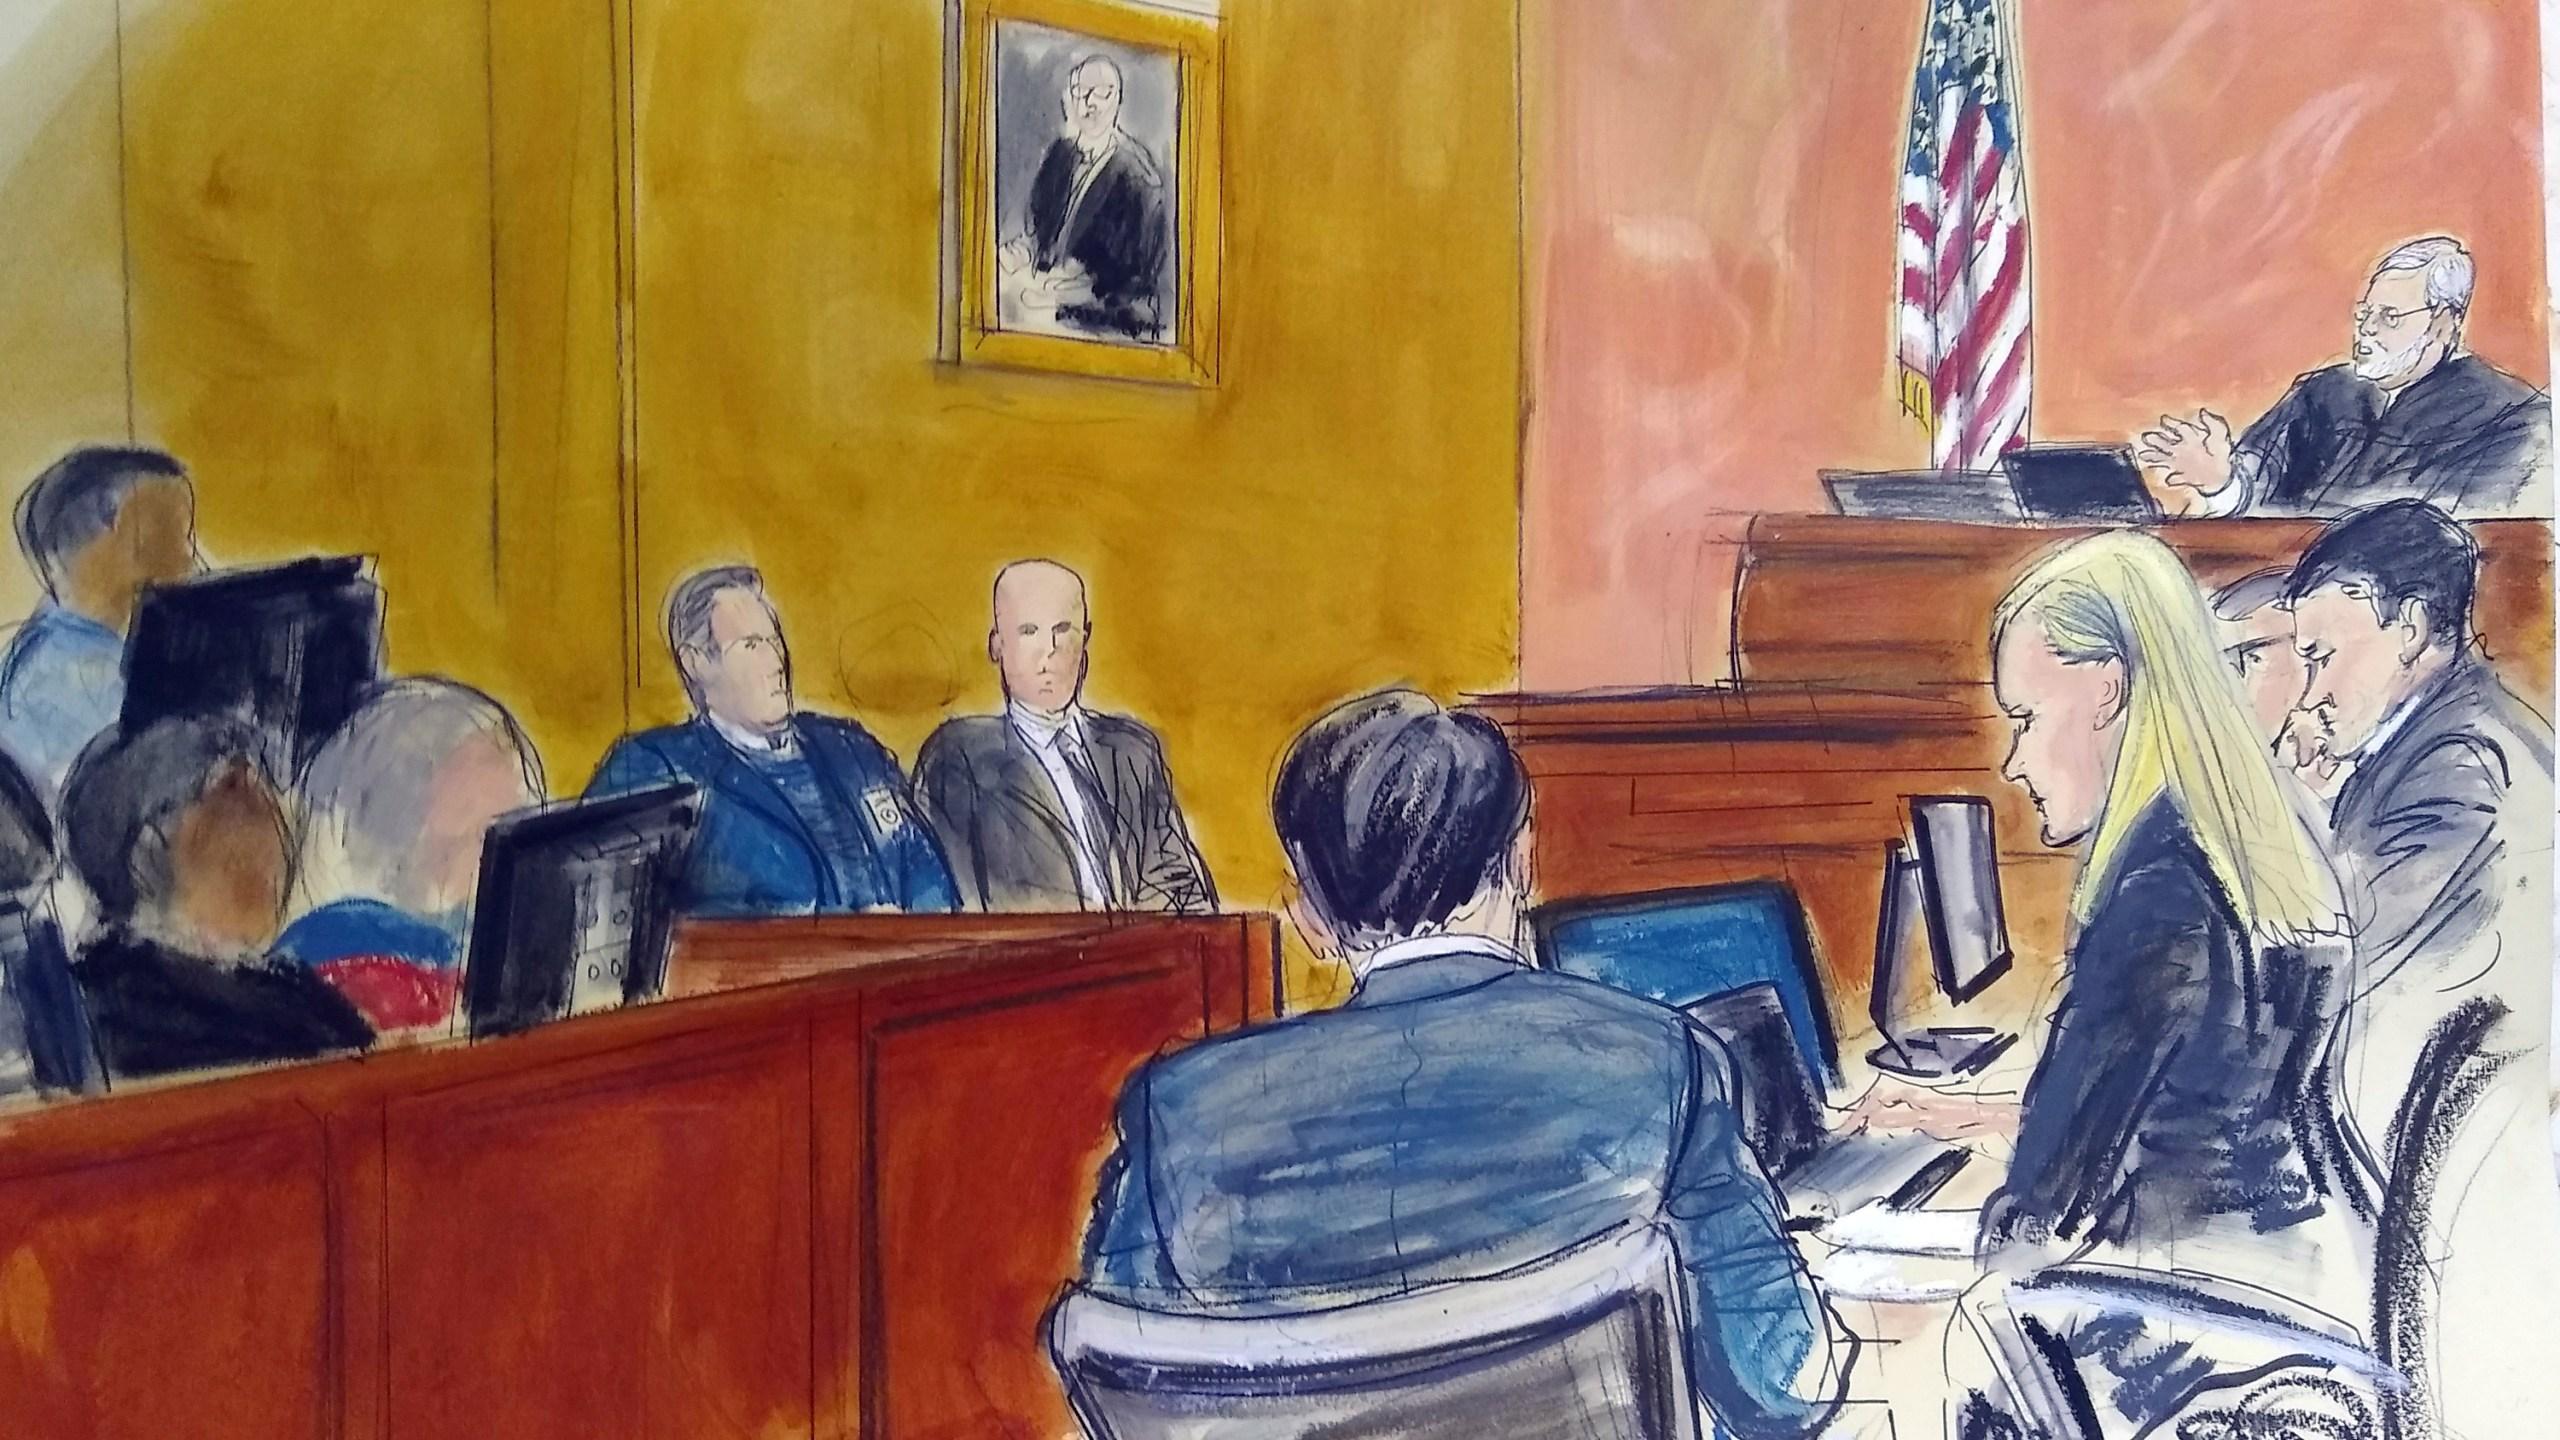 El_Chapo_Prosecution_81026-159532.jpg44631225